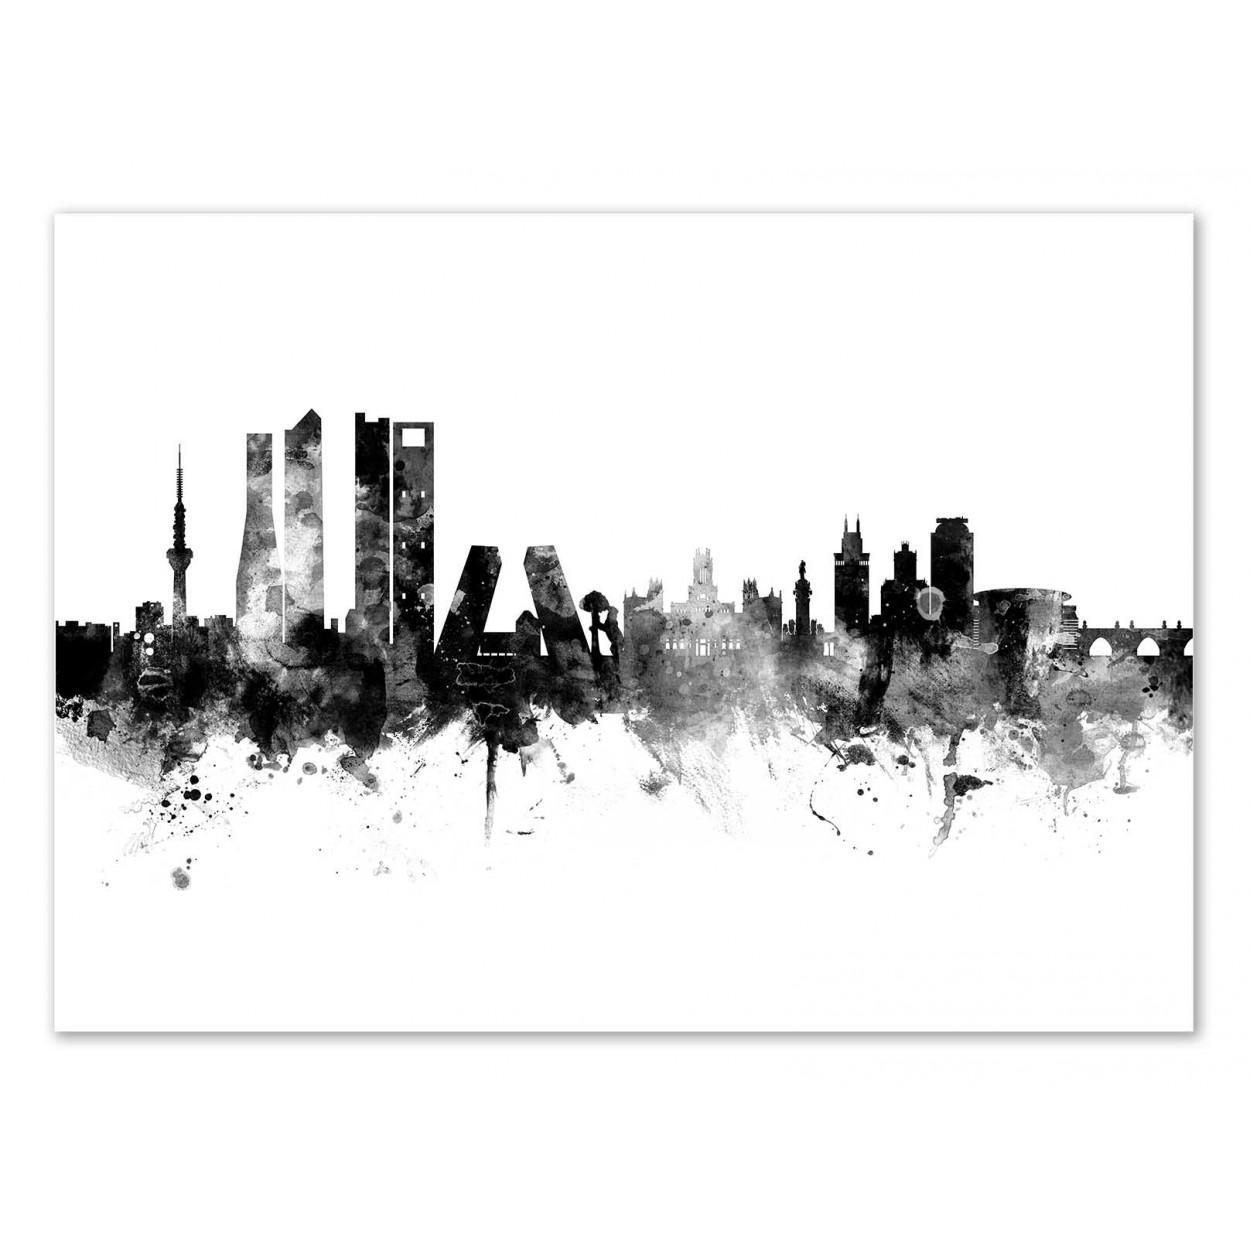 MADRID SPAIN SKYLINE -   Affiche d'art 50 x 70 cm